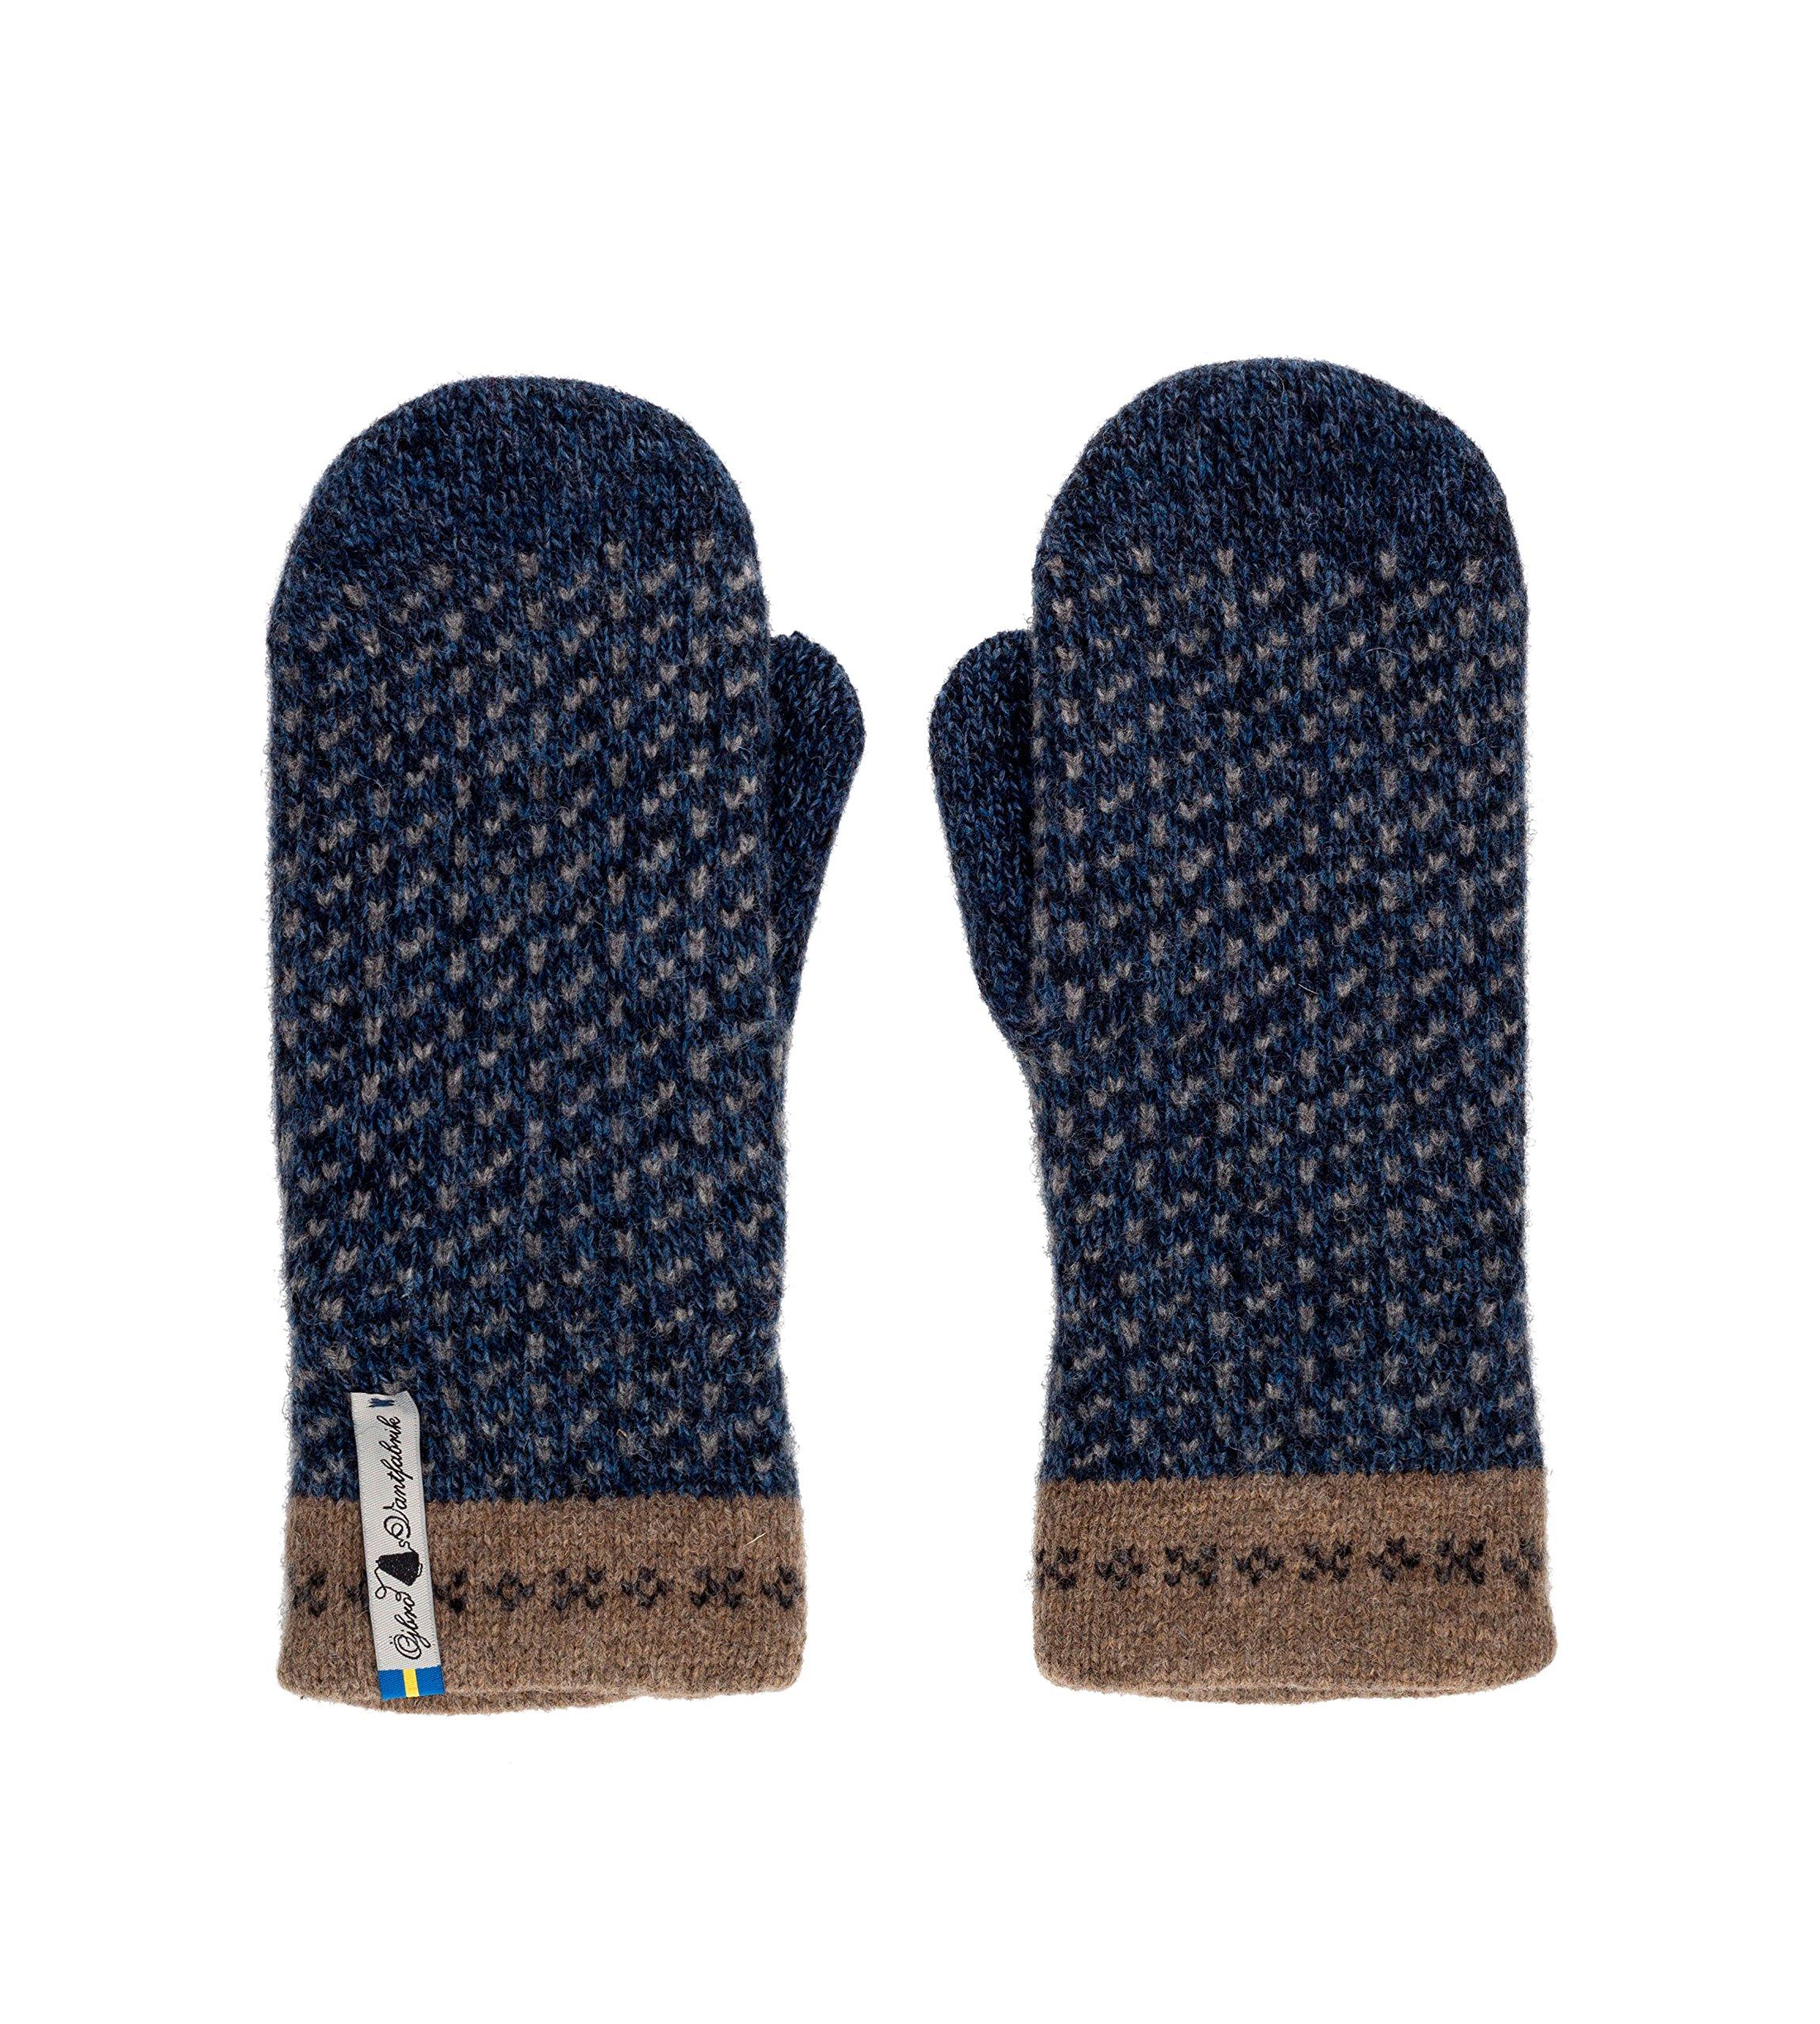 Öjbro Swedish made 100% Merino Wool Soft Thick & Extremely Warm Mittens (Medium, Skaftö Marin)